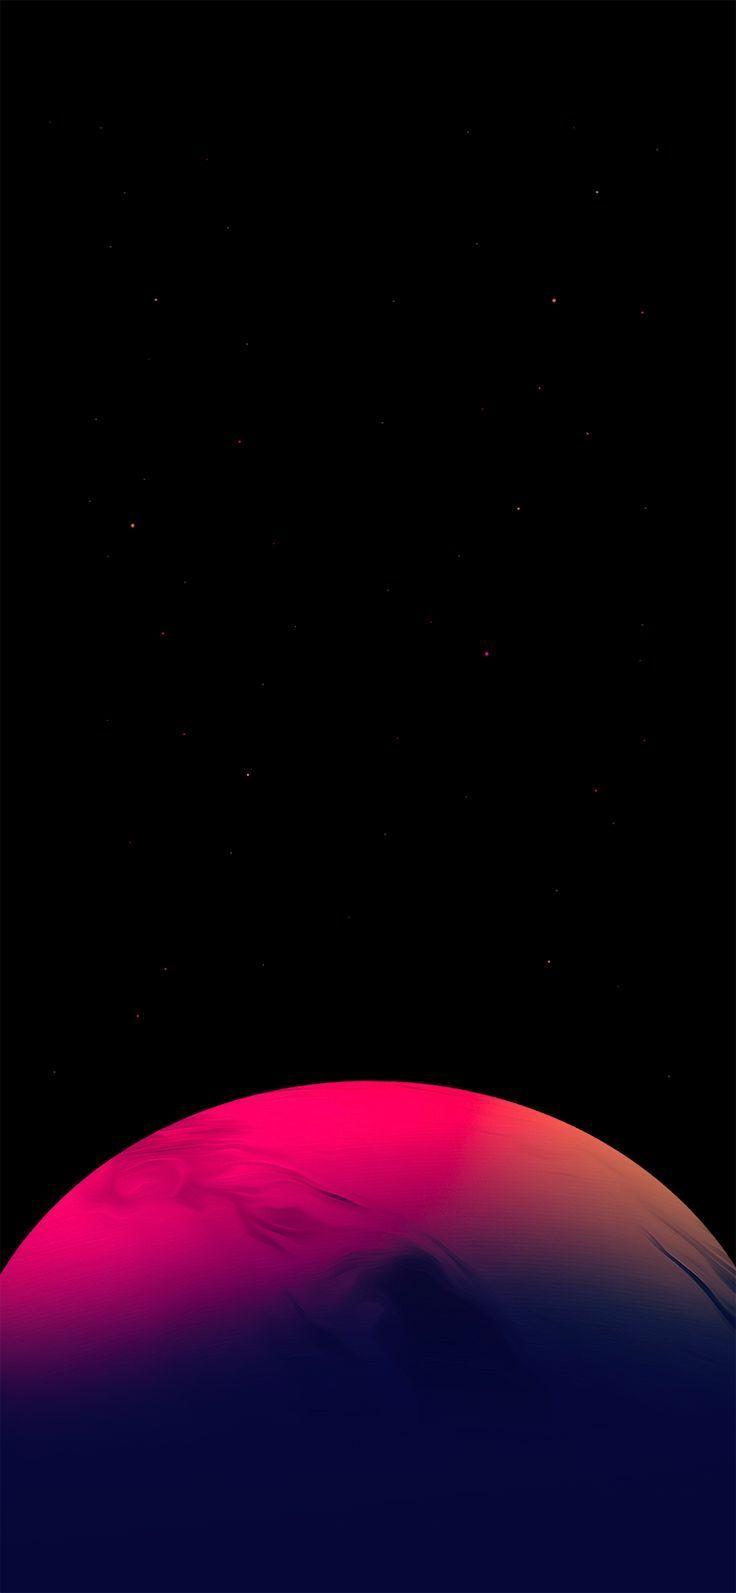 Planet Space Von Ar72014 Iphone X Xs Xr Xsmax Wallpaper Iphone Androi Space Iphone Wallpaper Iphone Wallpaper Hipster Android Wallpaper